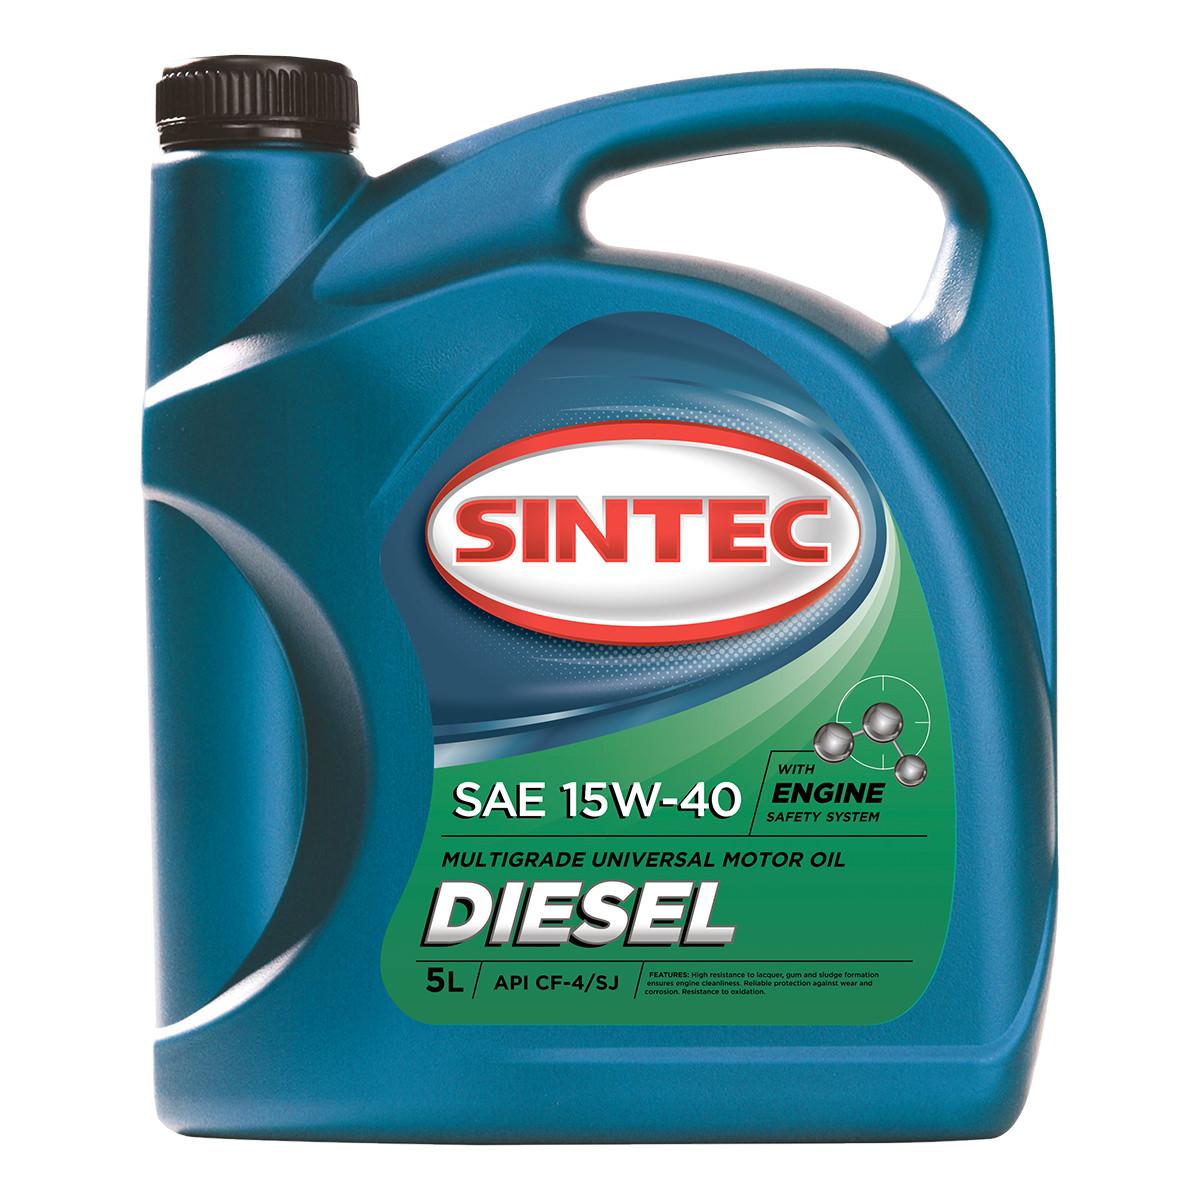 Масло SINTEC Diesel SAE 15W-40 API CF-4/CF/SJ